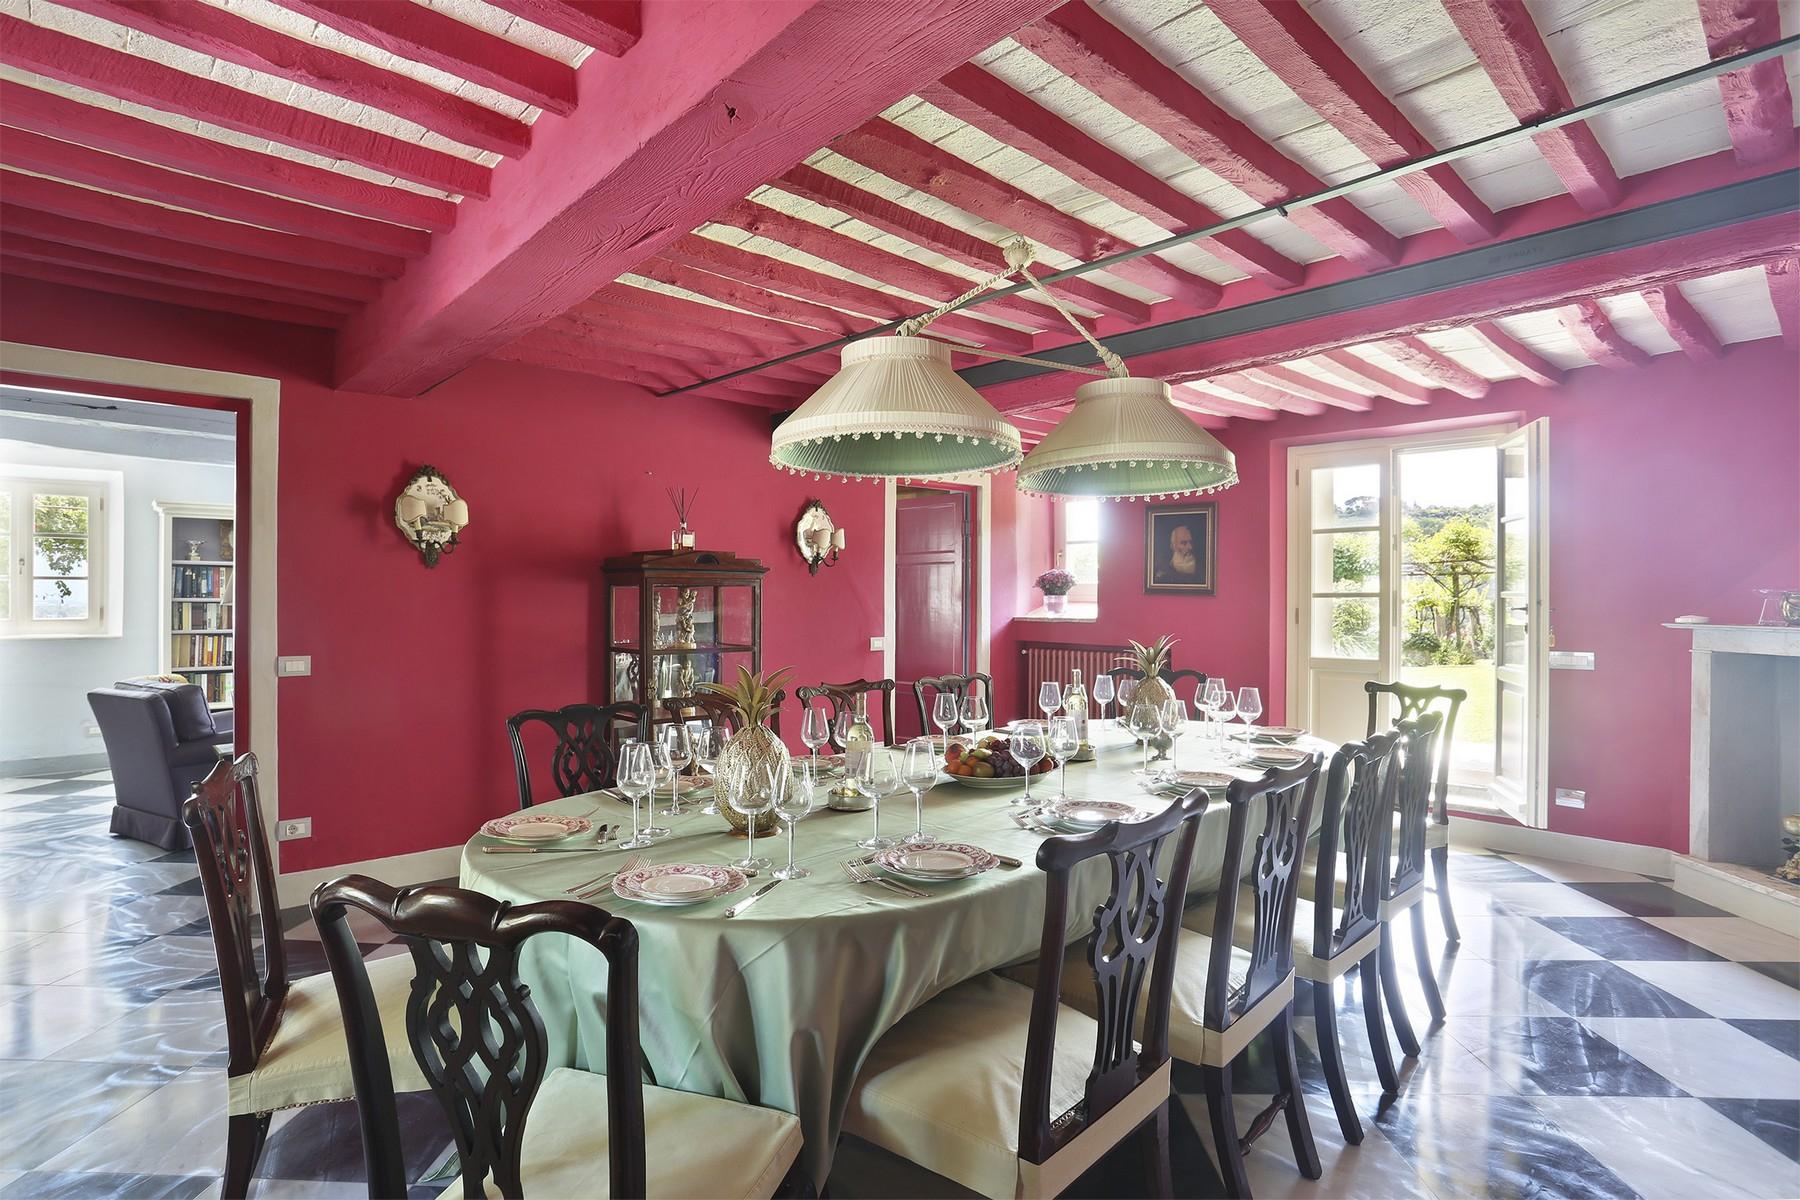 Villa in Vendita a Lucca: 5 locali, 735 mq - Foto 24